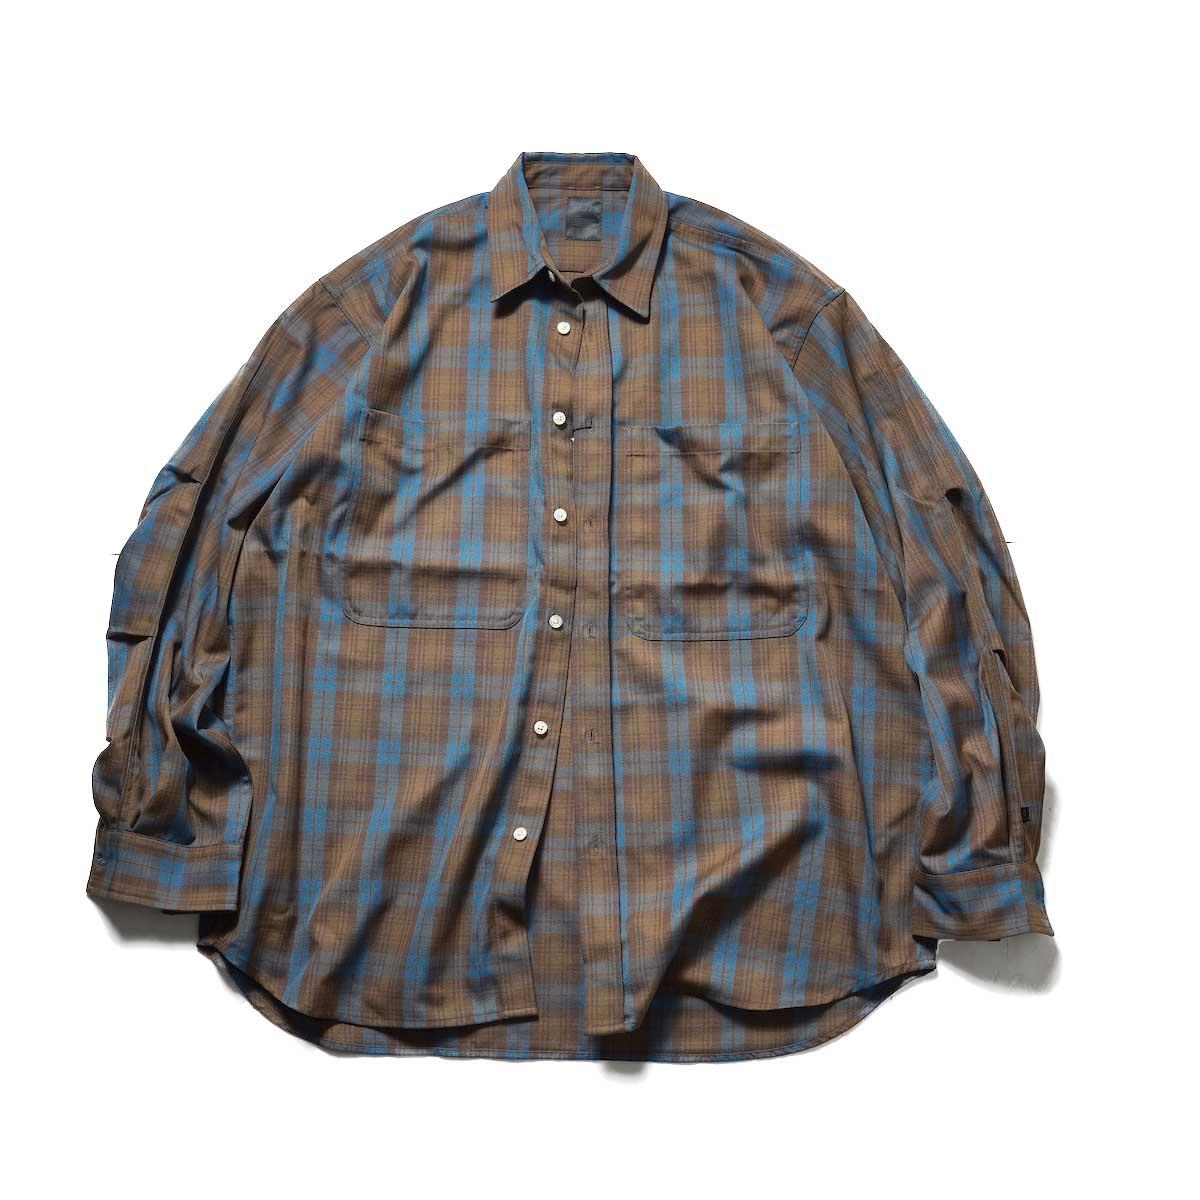 DAIWA PIER39 / TECH FLANNEL WORKER'S SHIRTS (Brown Check)